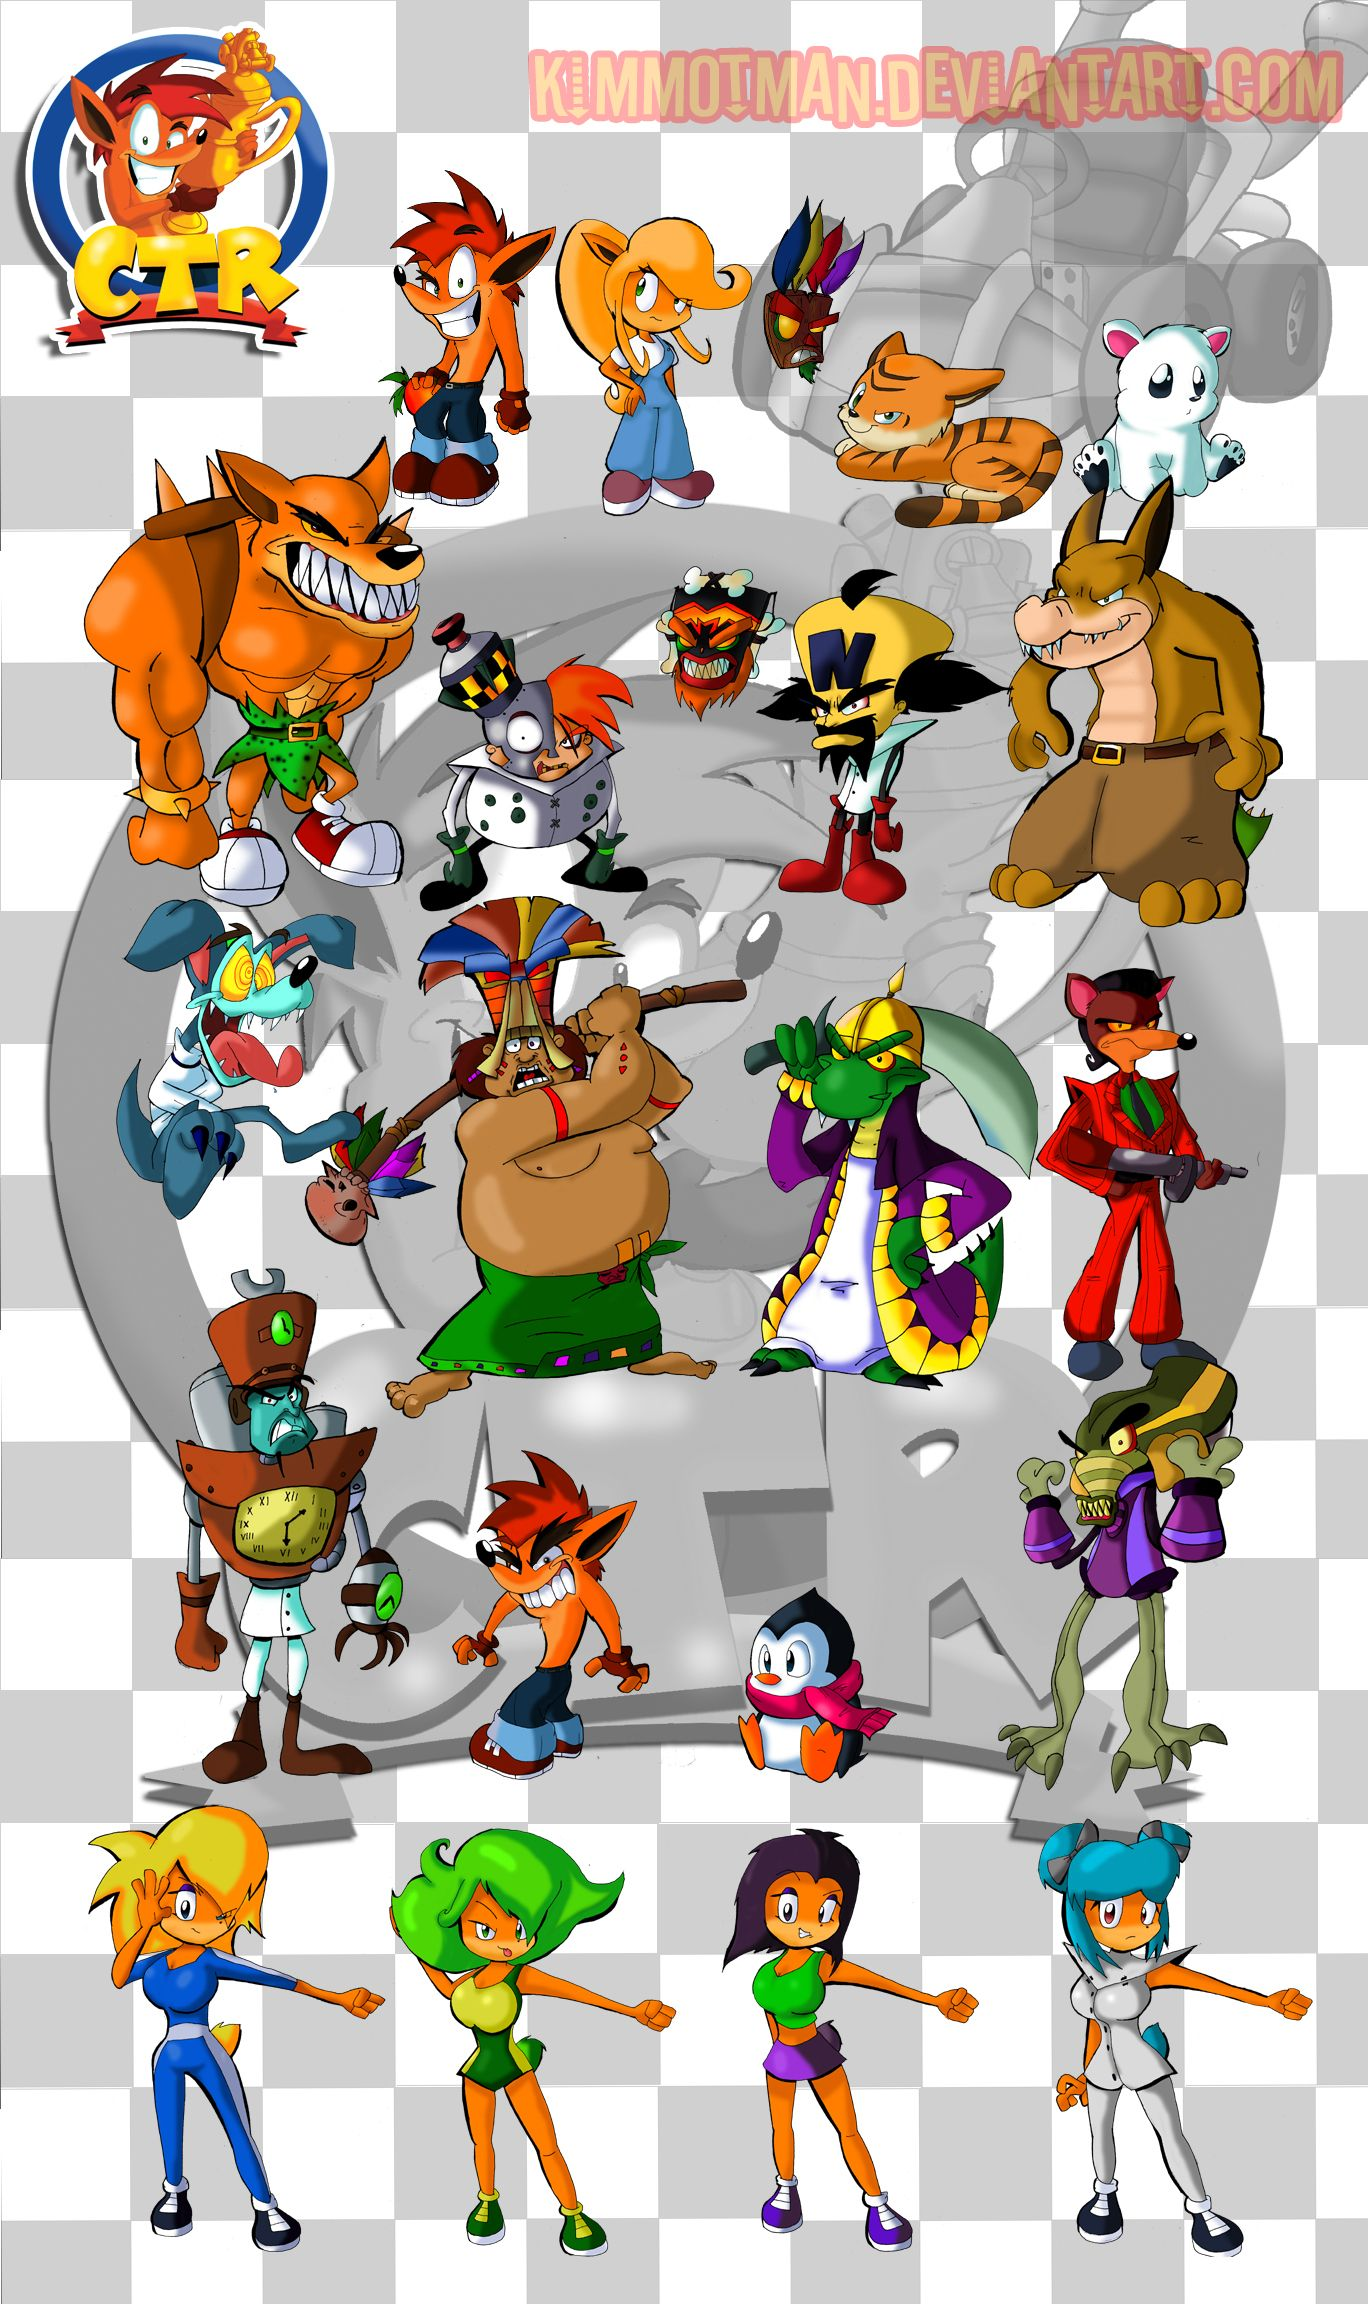 crash team racing characters by kimmotman on deviantart coco